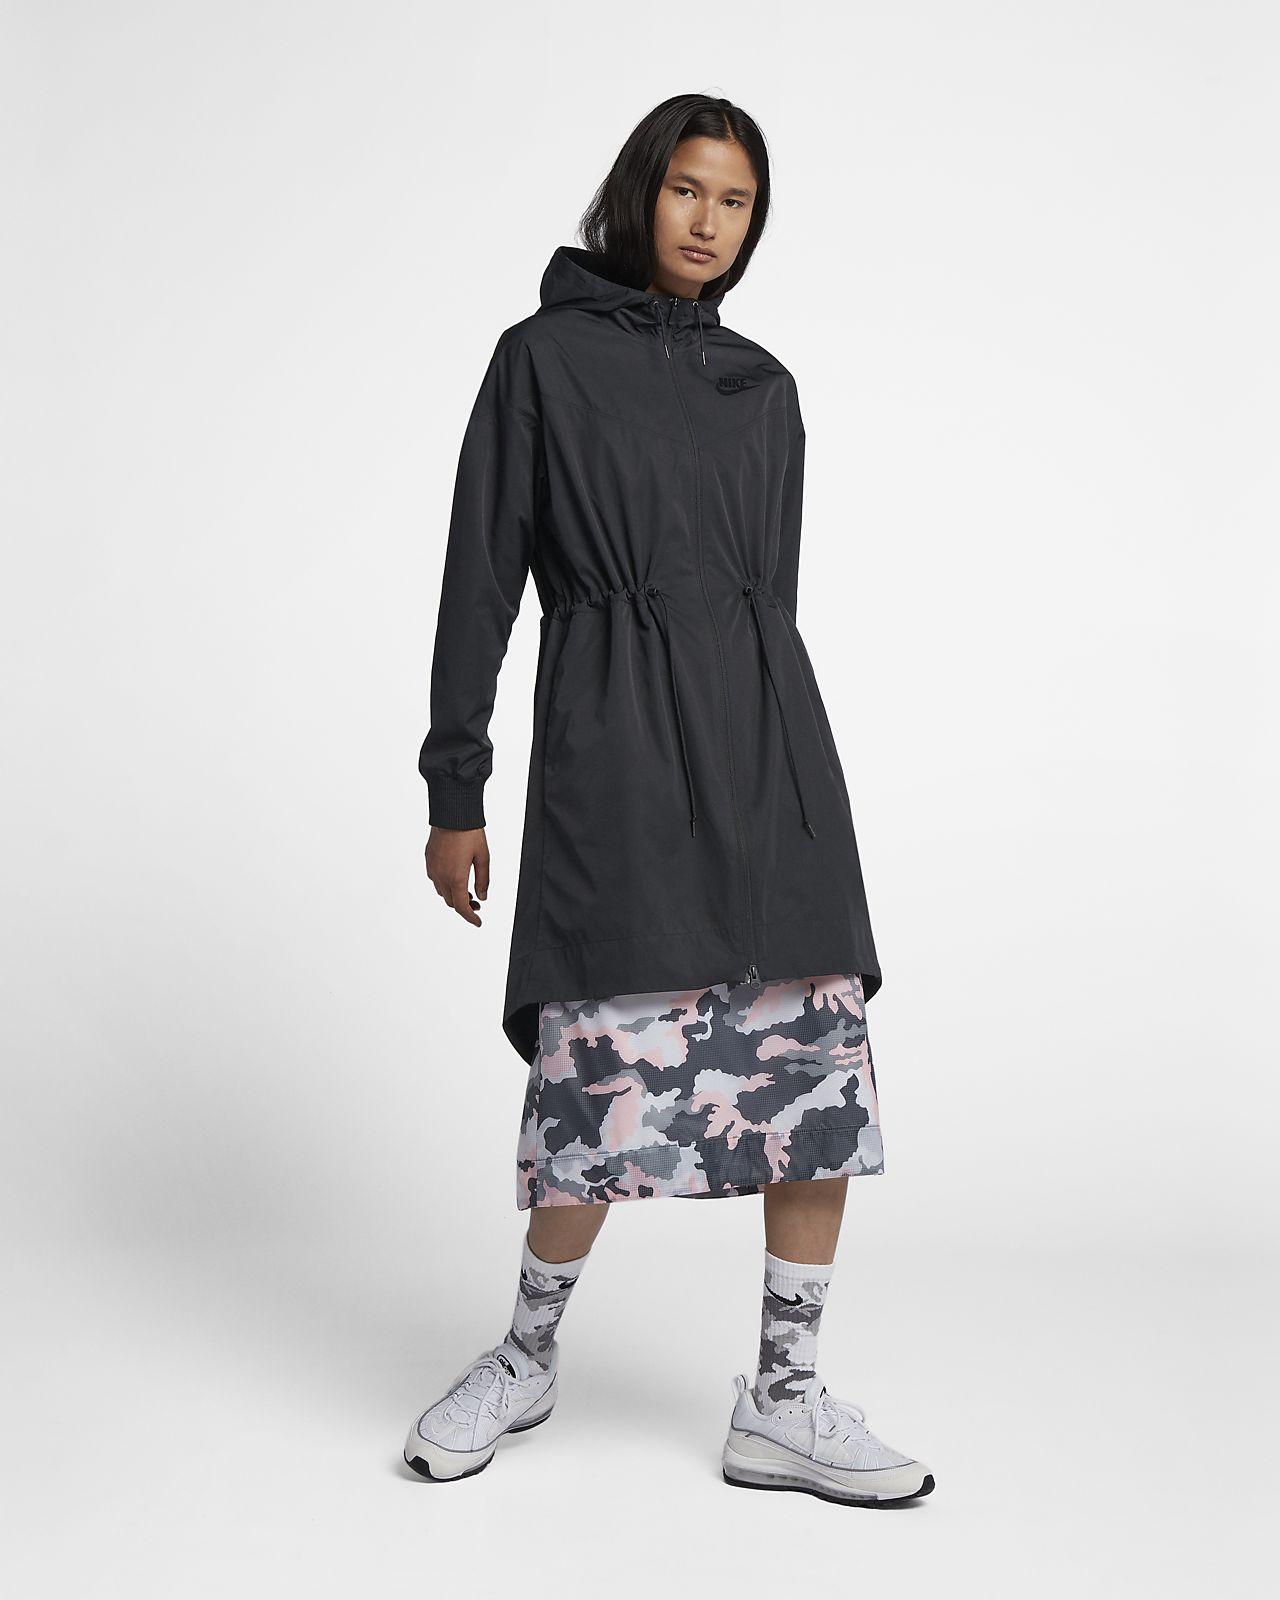 Femme Windrunner Nike Shield Veste Sportswear Pour c45LAR3jqS